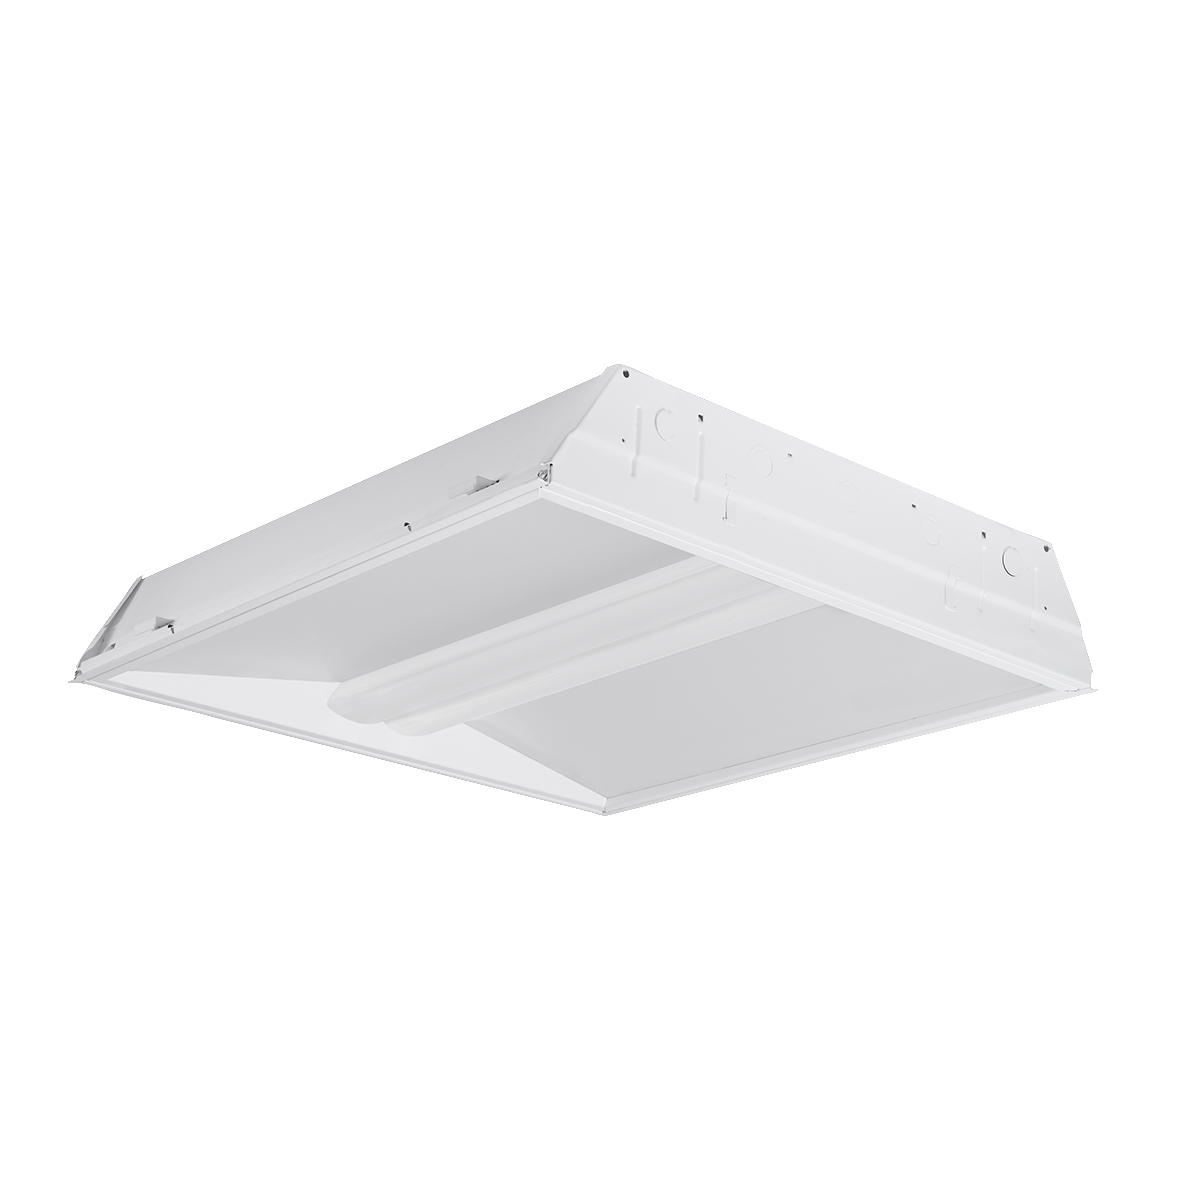 Recessed linear troffers commercial indoor lighting lighting rla arubaitofo Gallery